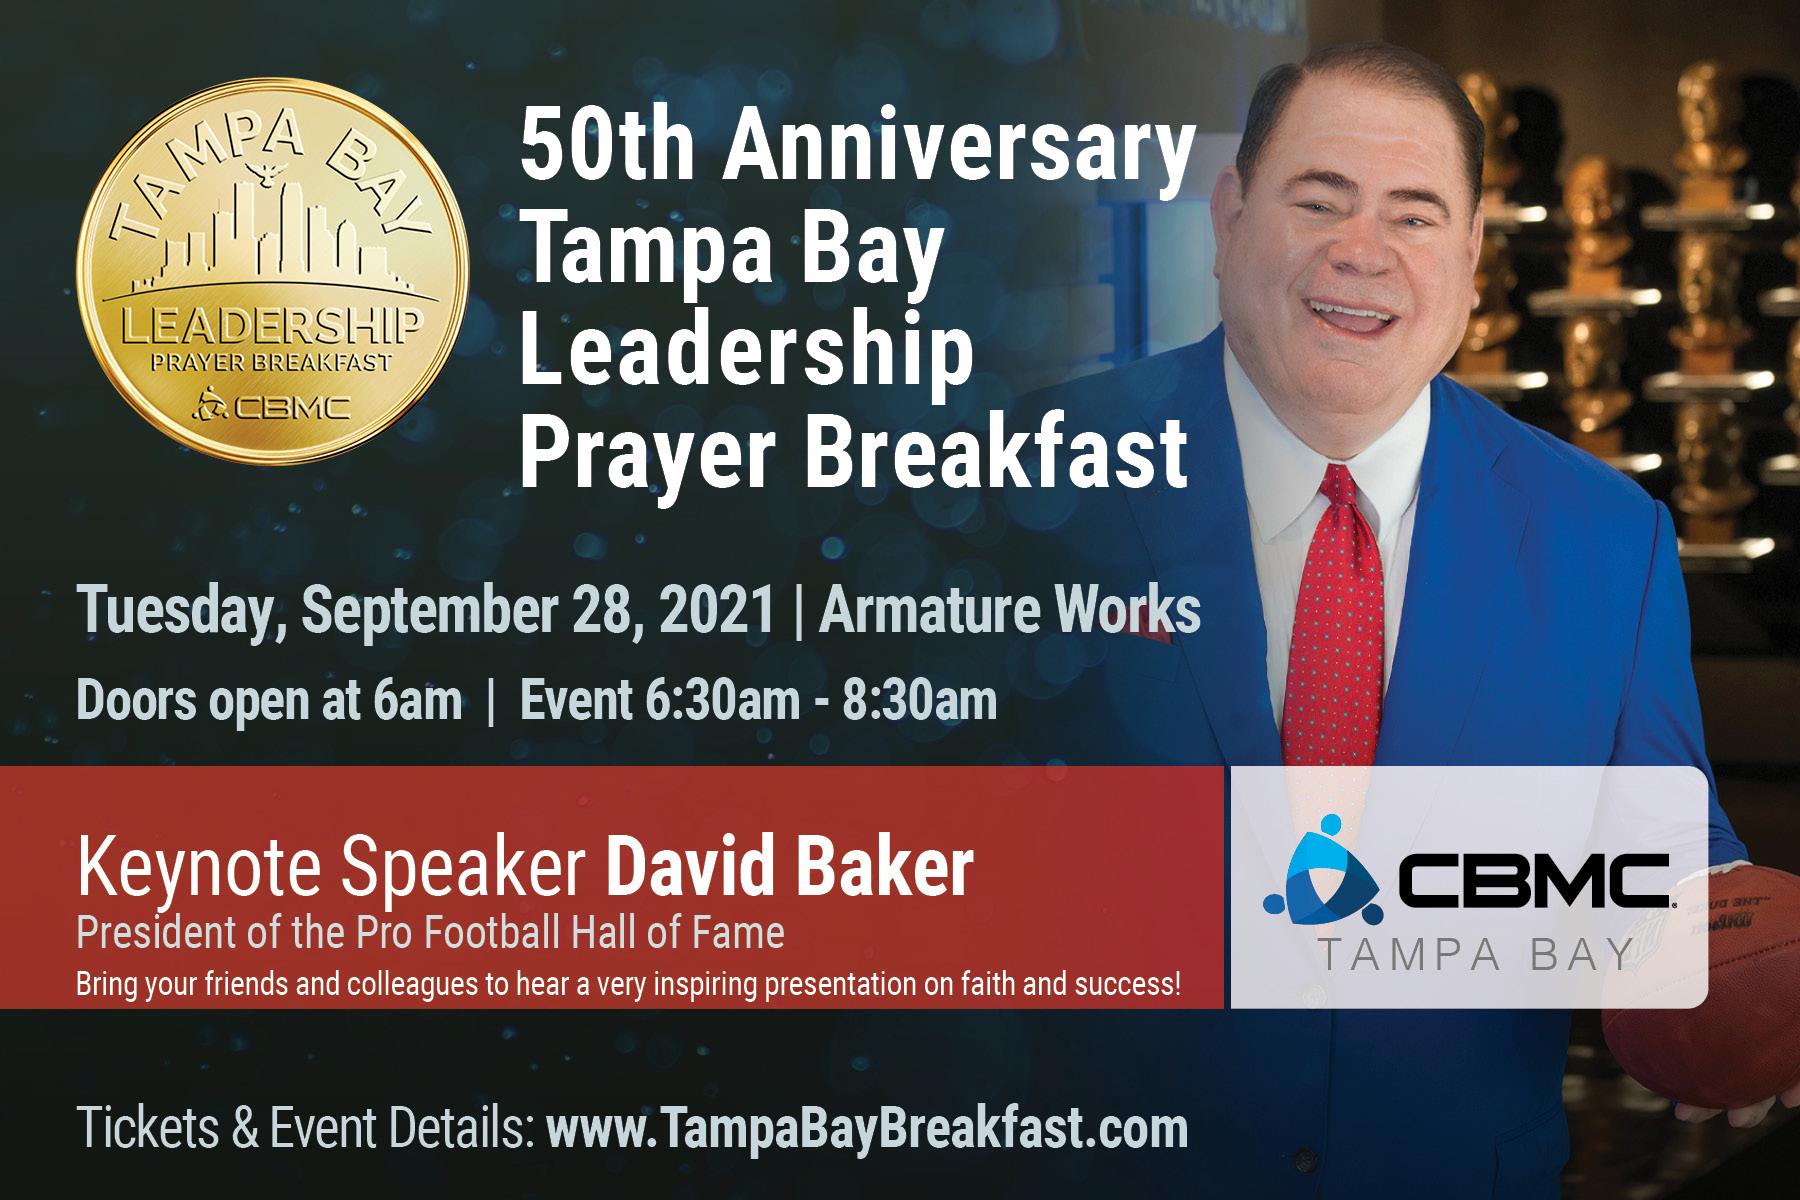 CBMC-PrayerBreakfast-SavetheDateCard-2021-V2_converted